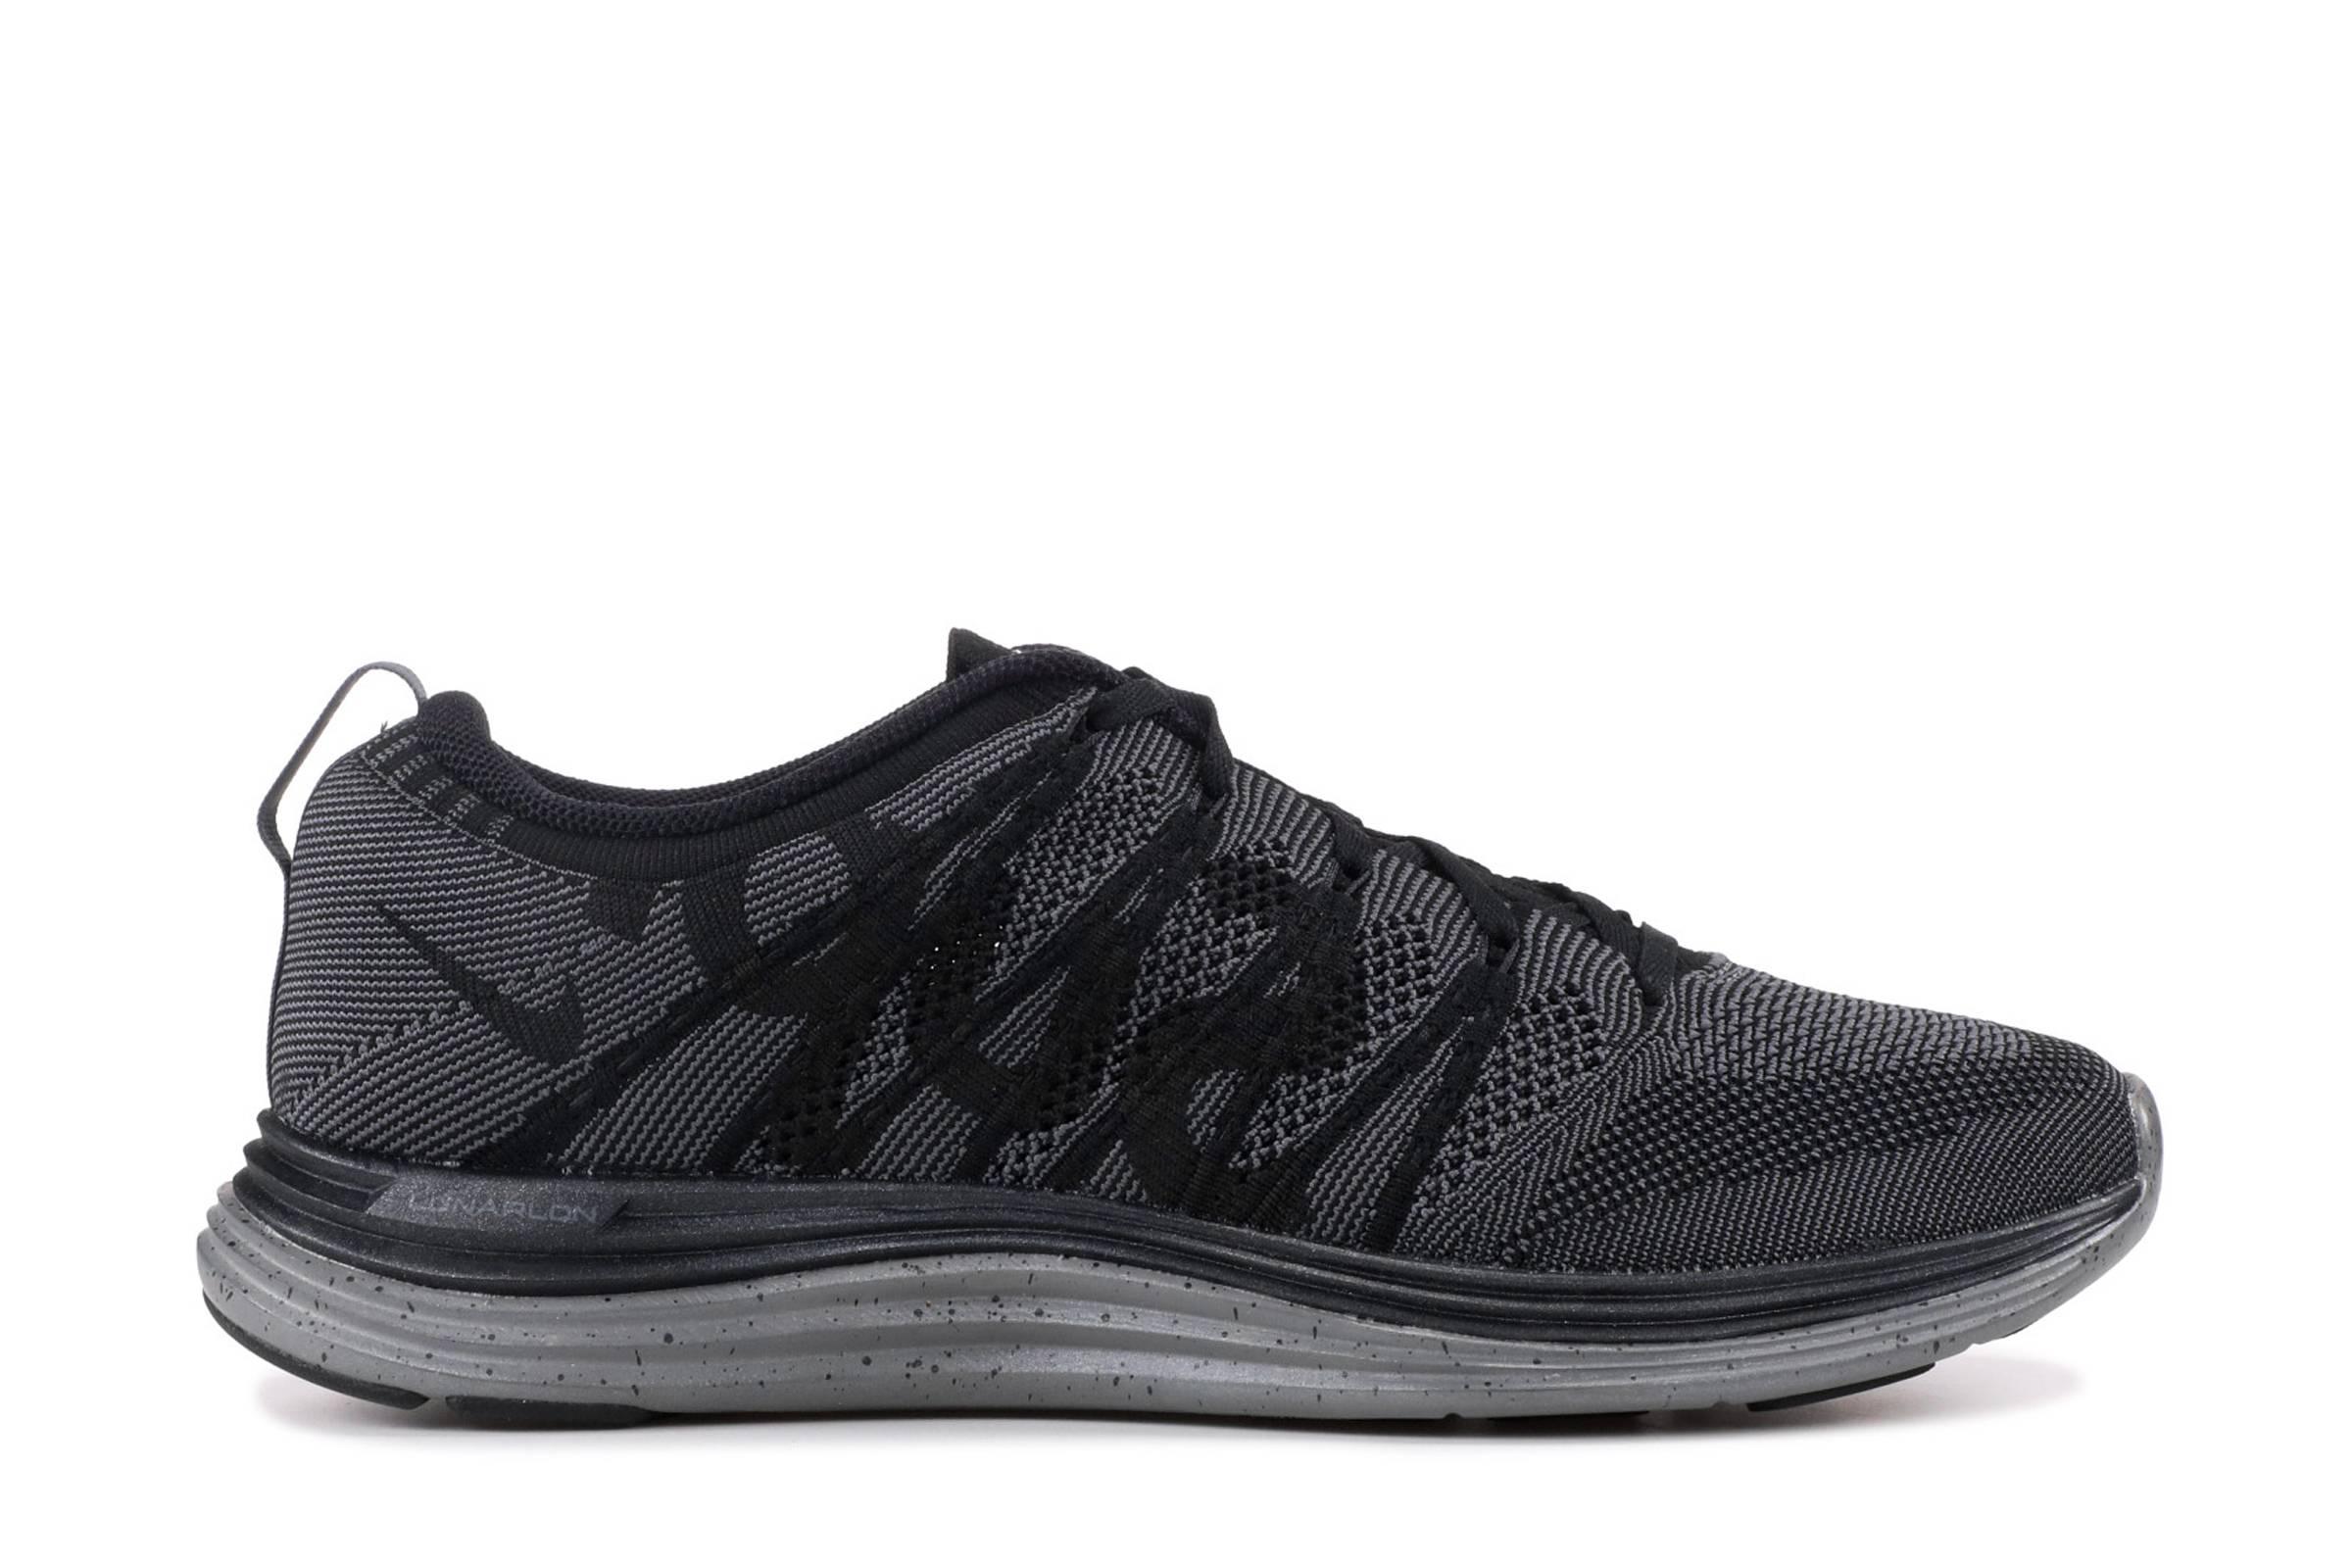 Supreme x Nike Flyknit Lunar 1+ (2013)